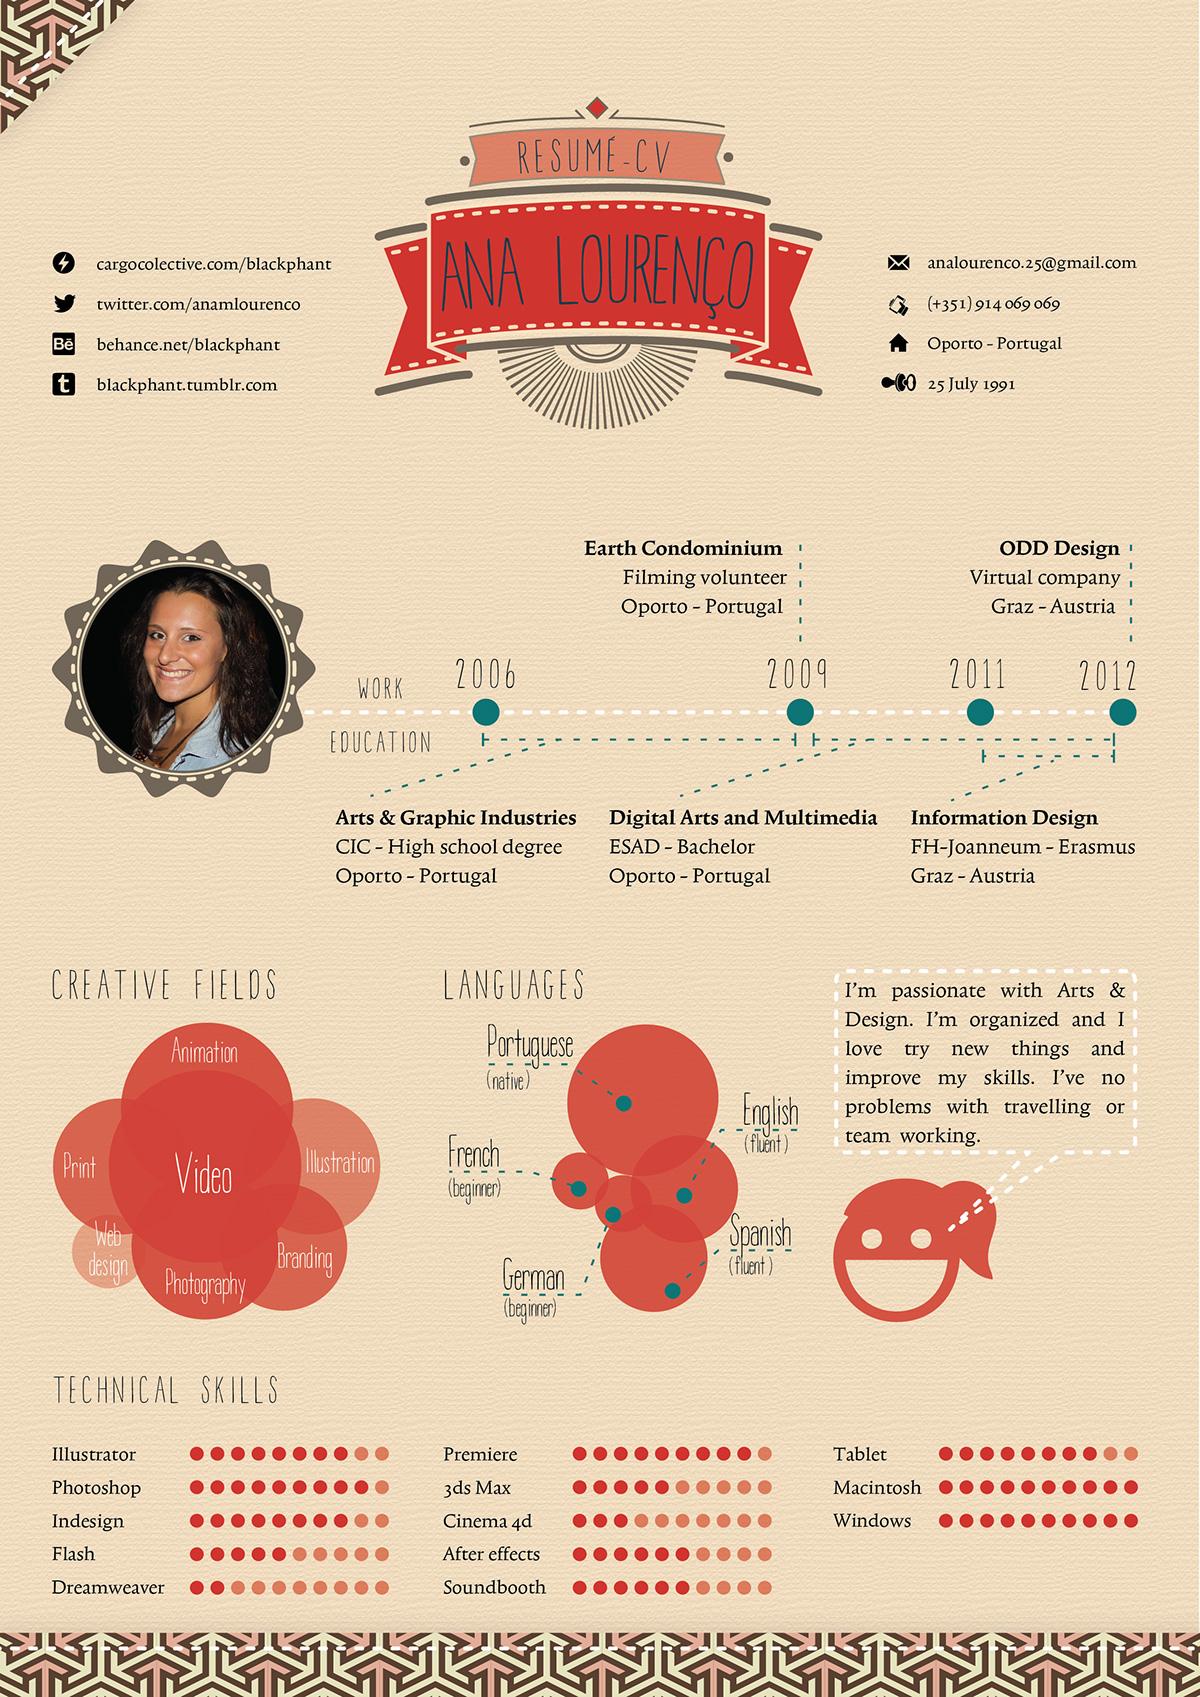 infographic resume template illustrator